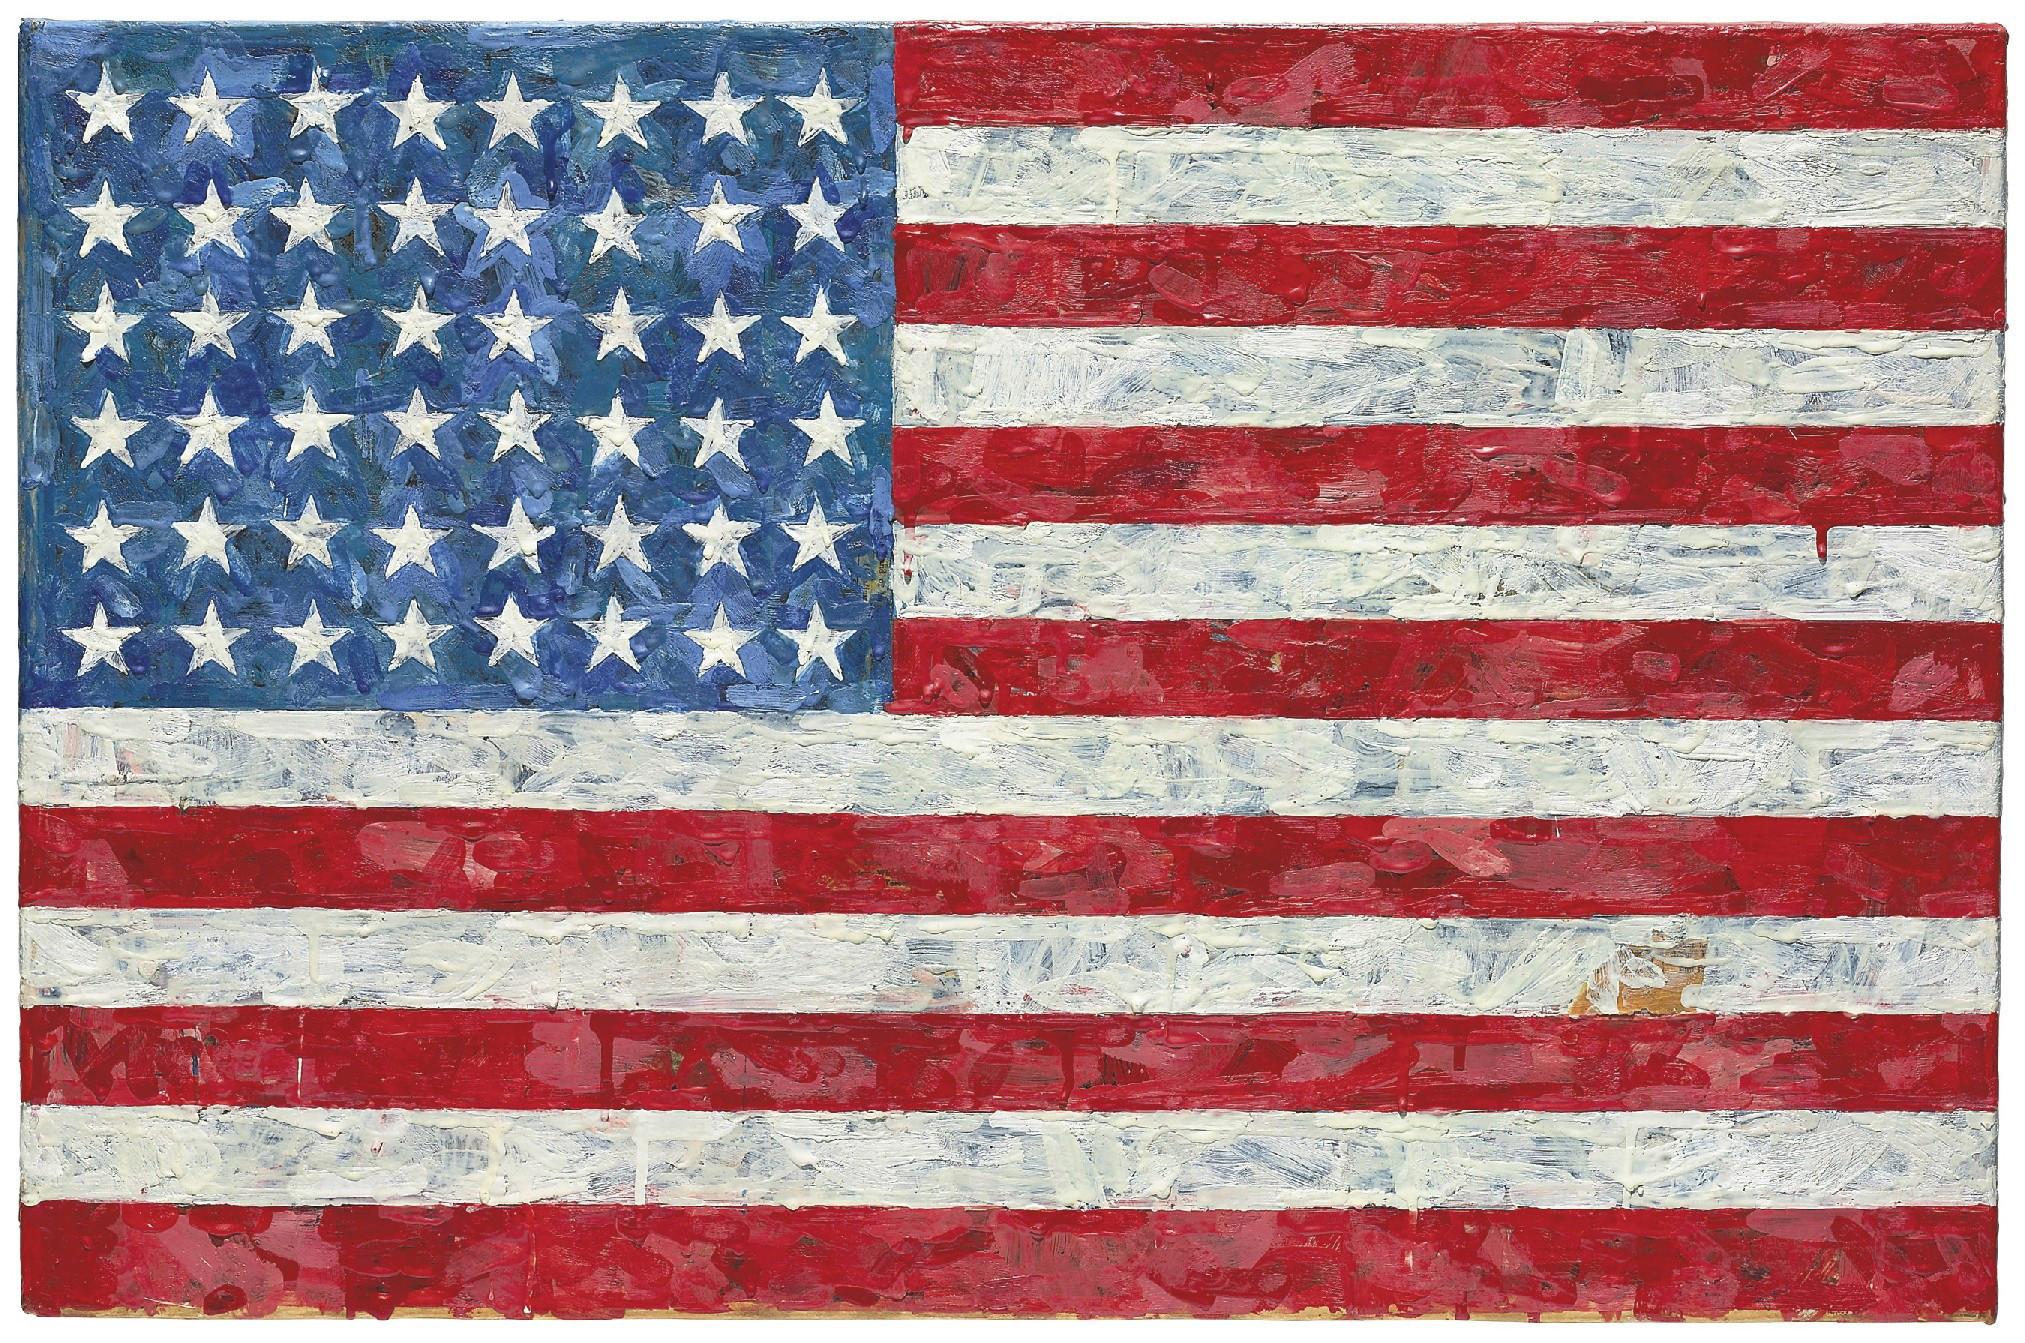 American Flag Wallpapers in Best px Resolutions | Carolyn Magnus  AHDzBooK Wallpapers